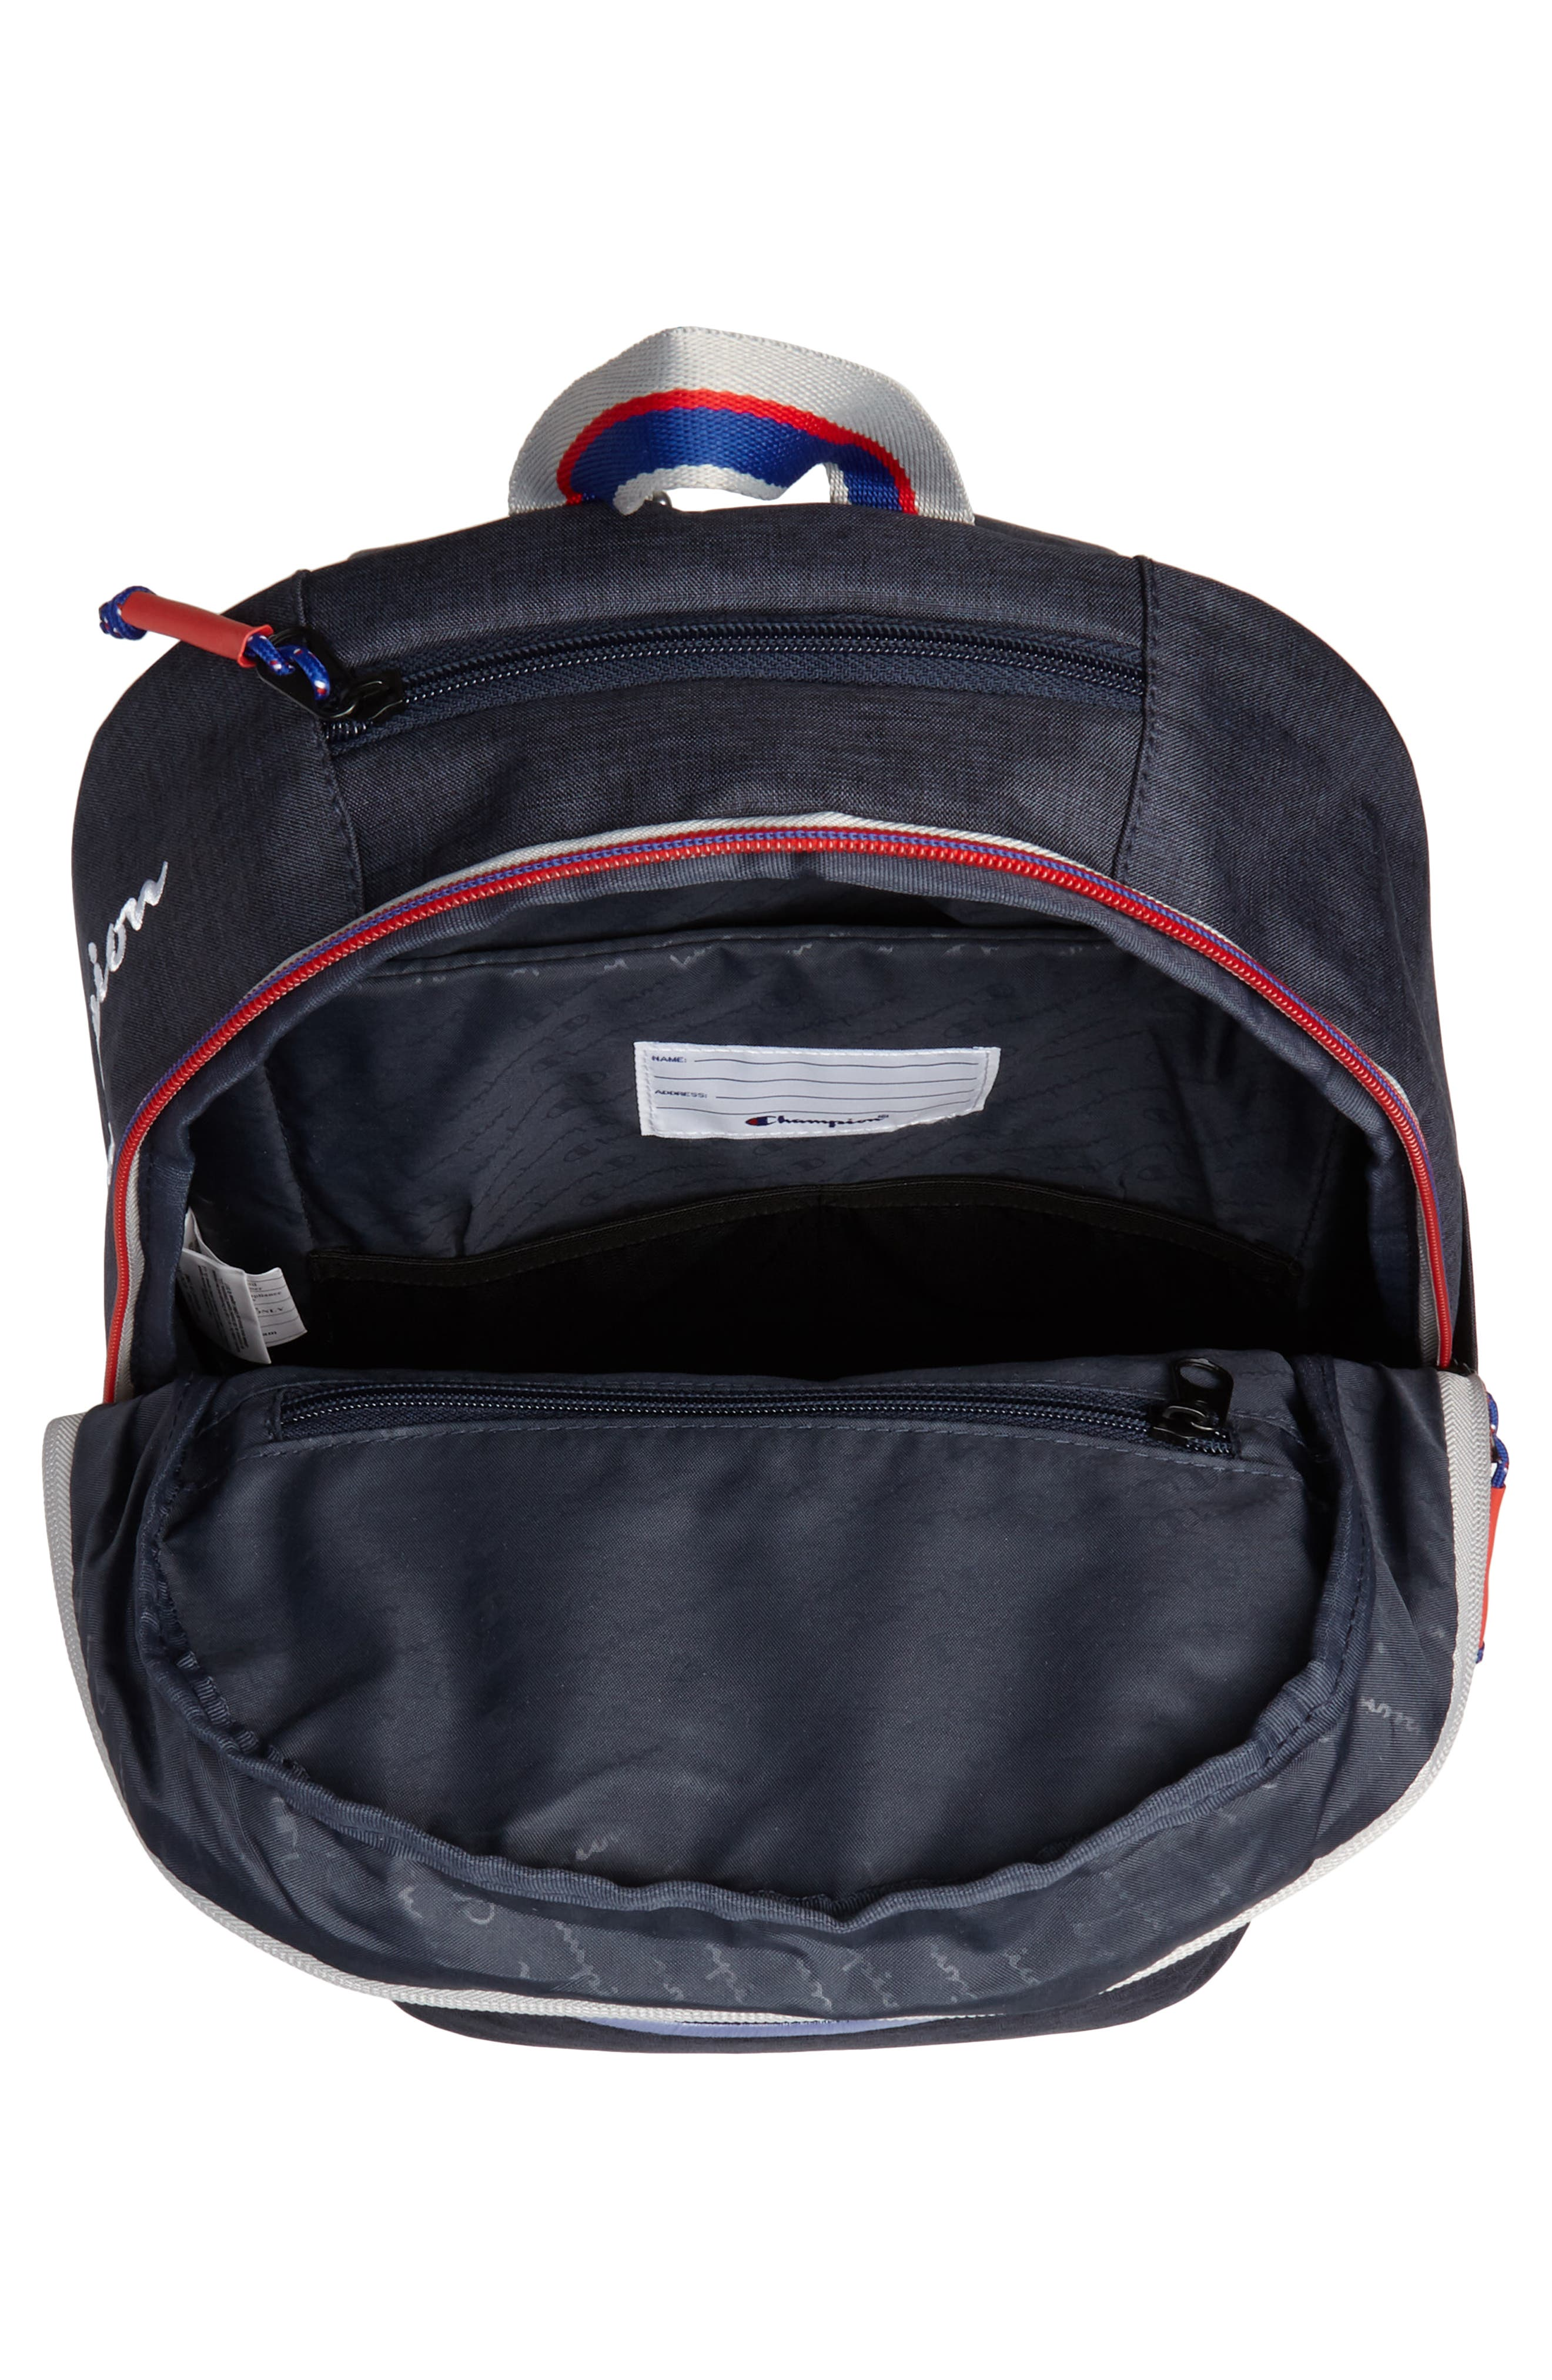 CHAMPION, Supercize Backpack, Alternate thumbnail 5, color, 410